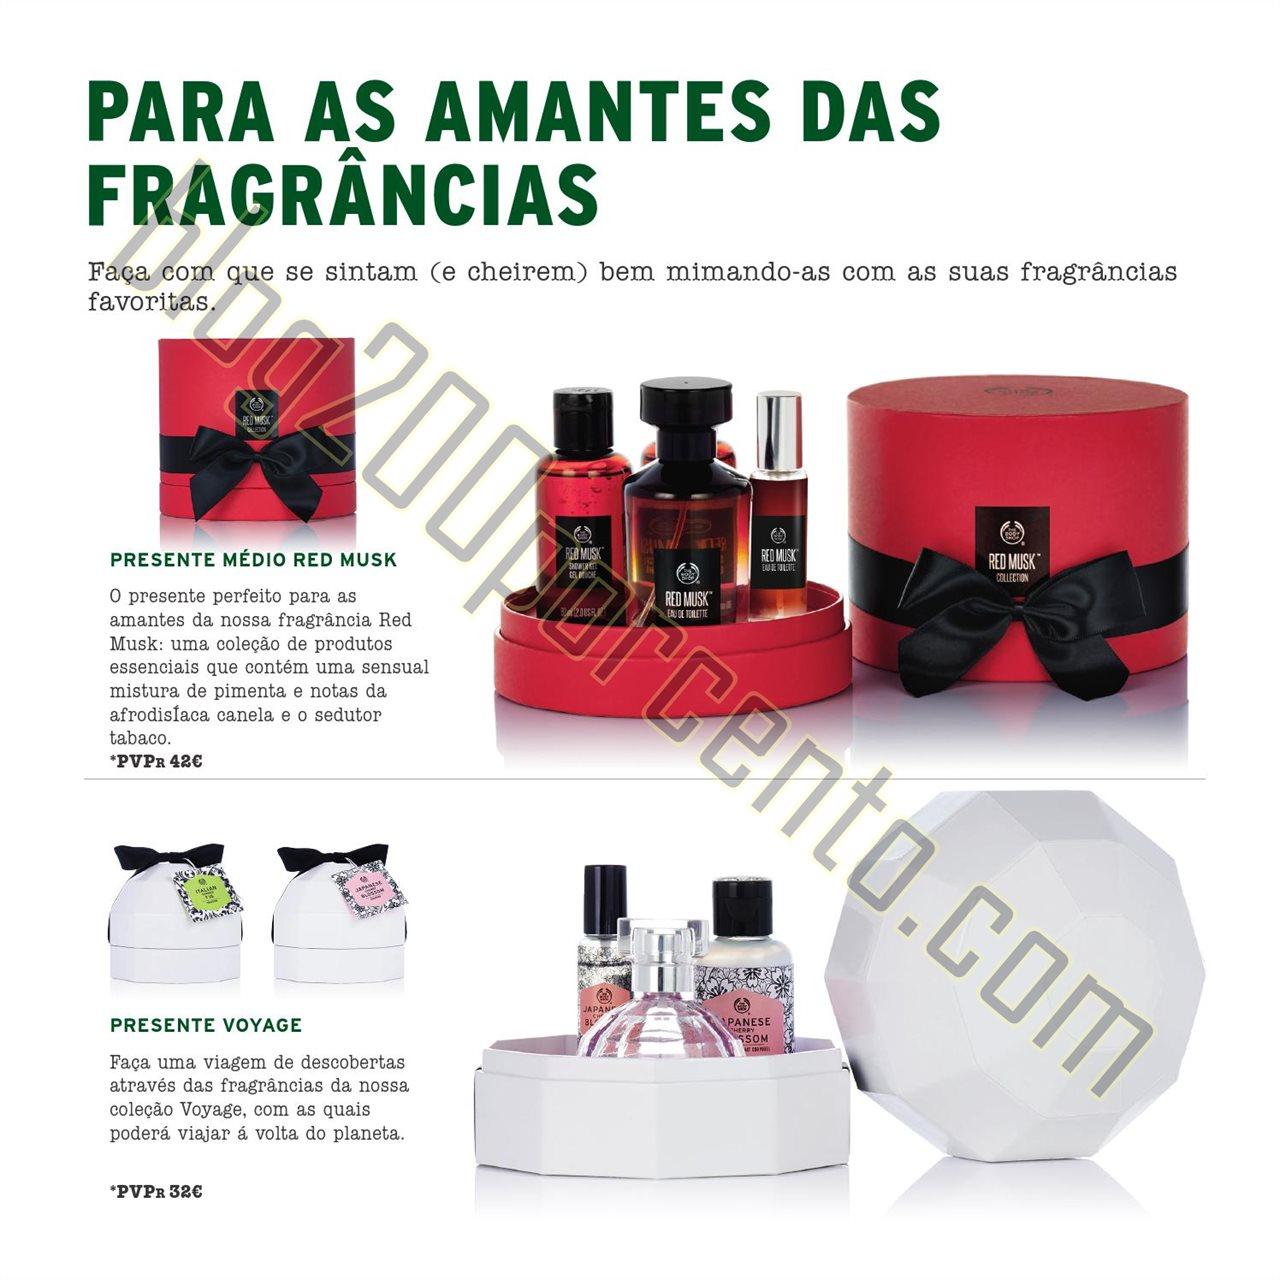 Novo Folheto THE BODY SHOP Natal 2015 p15.jpg